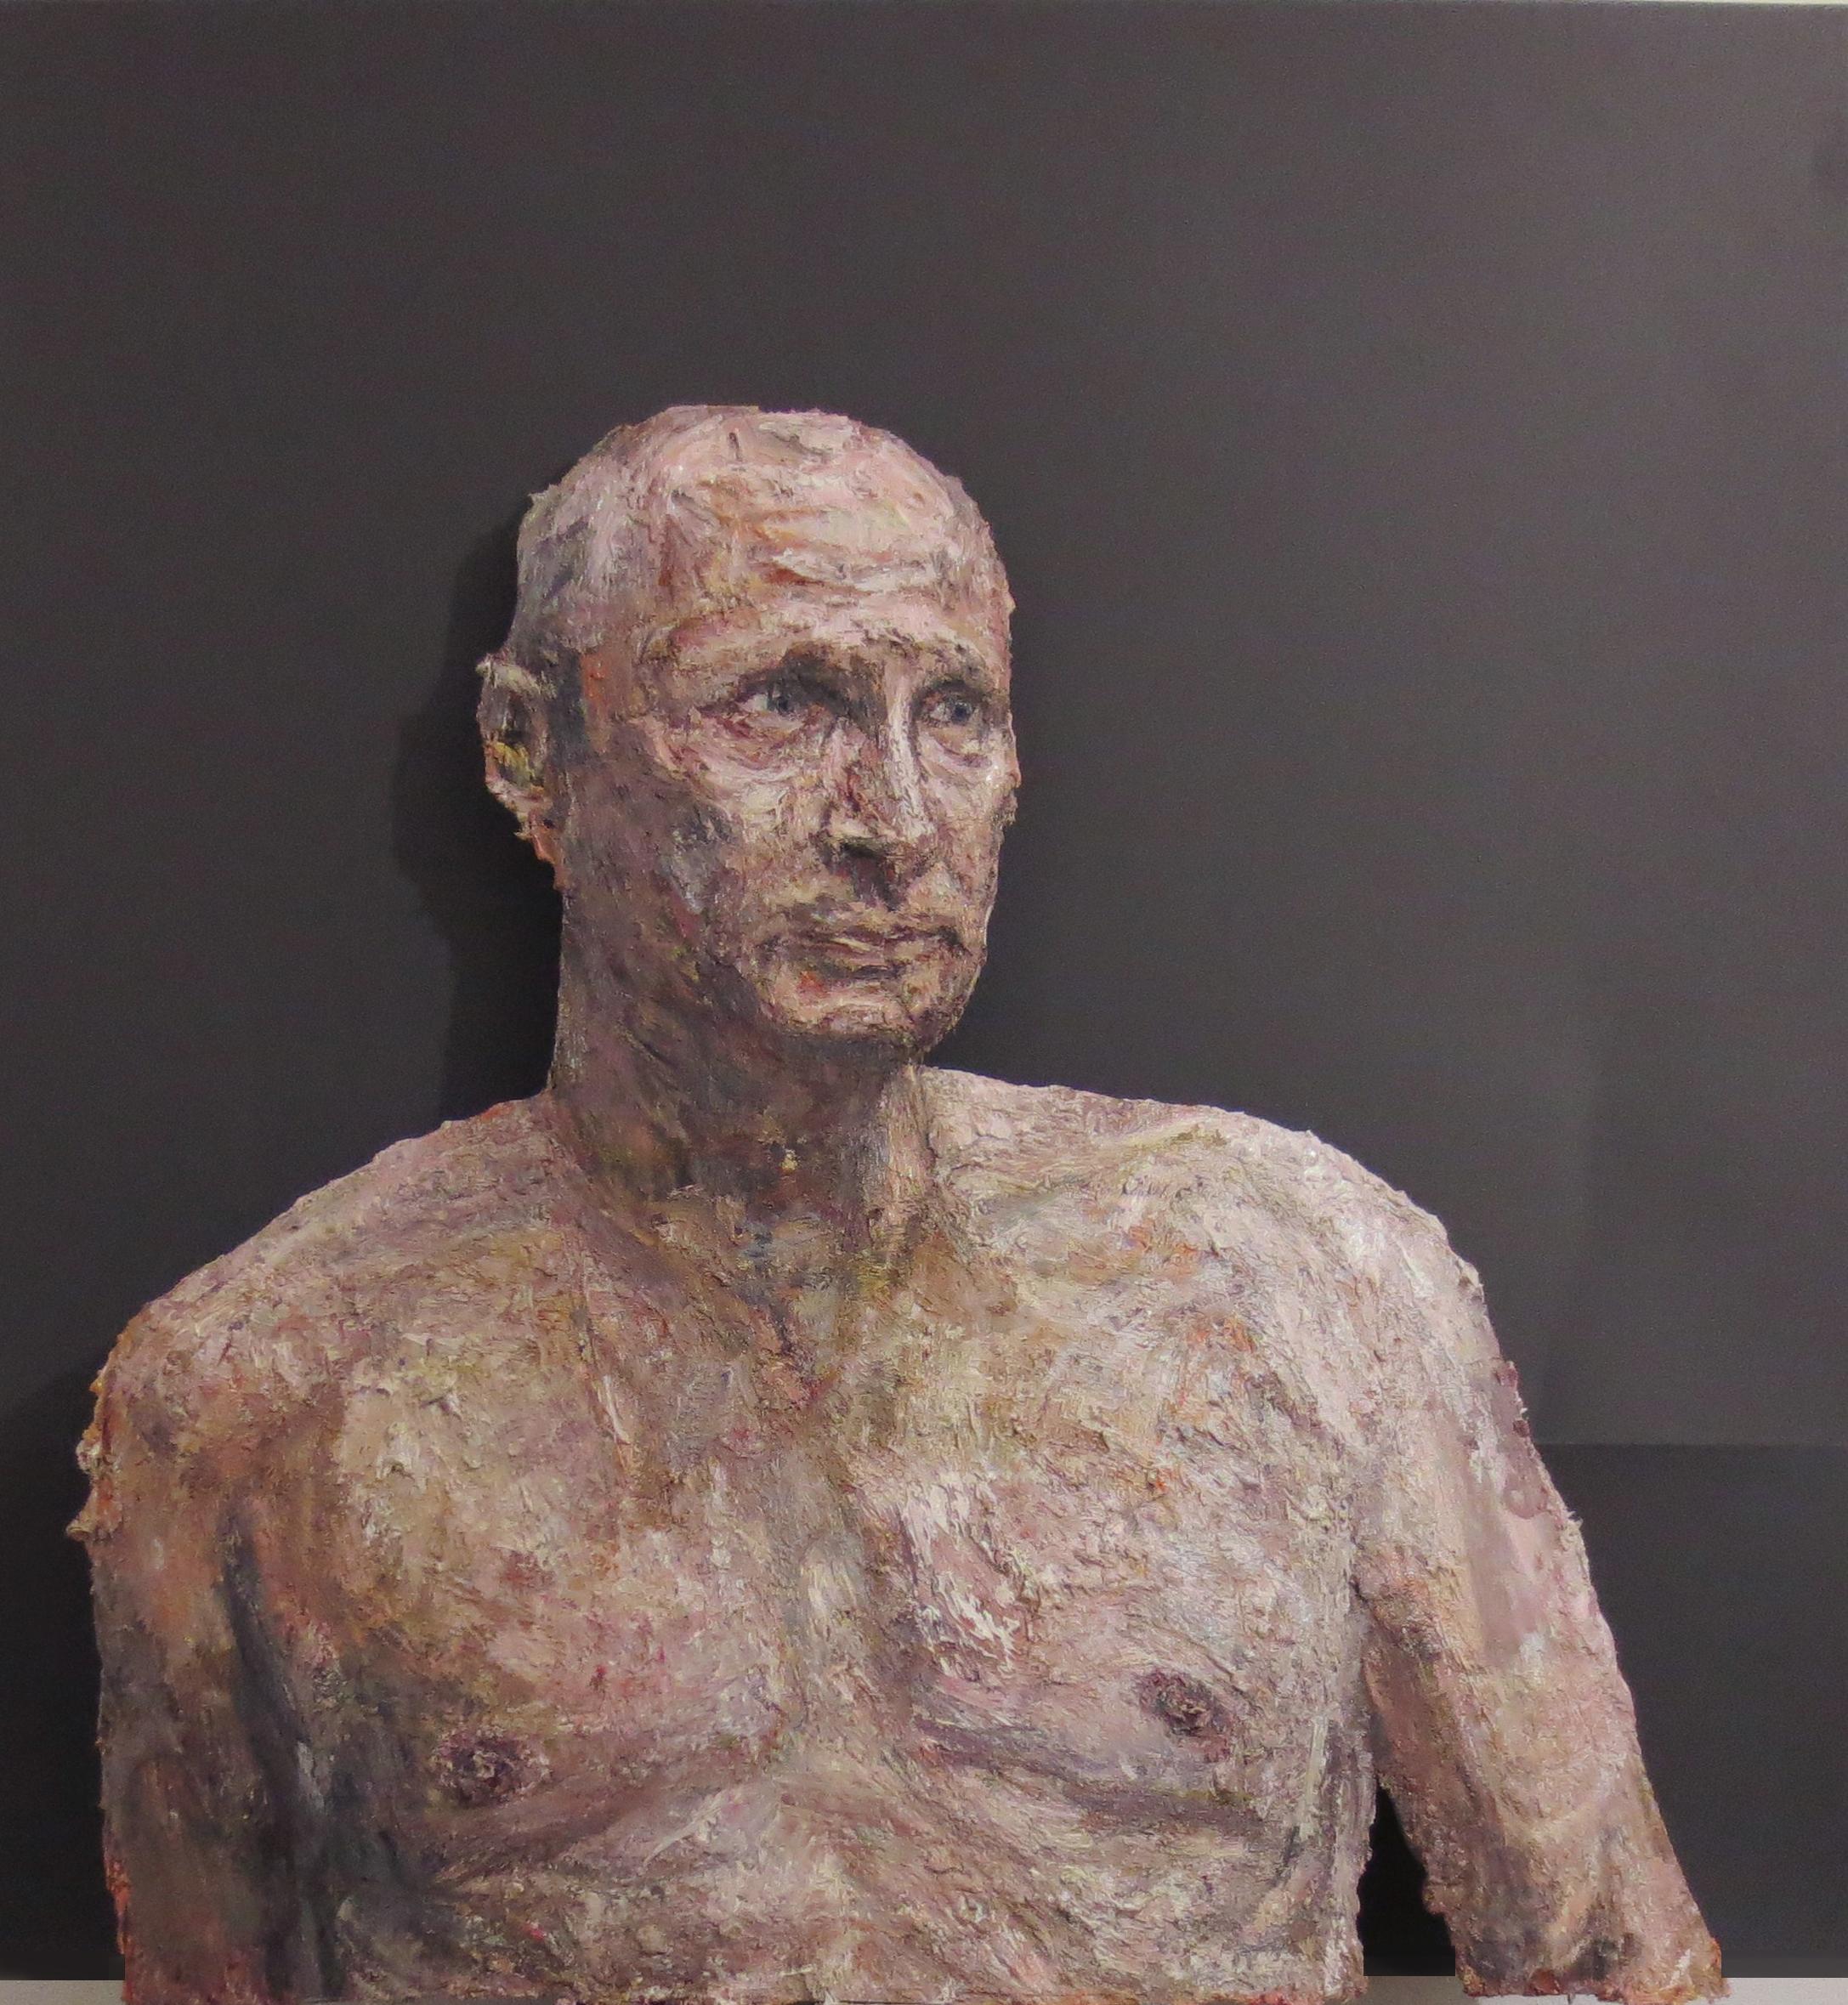 Aleksander Velišček, Putin, 2013, tecnica mista, 99 x 86 cm